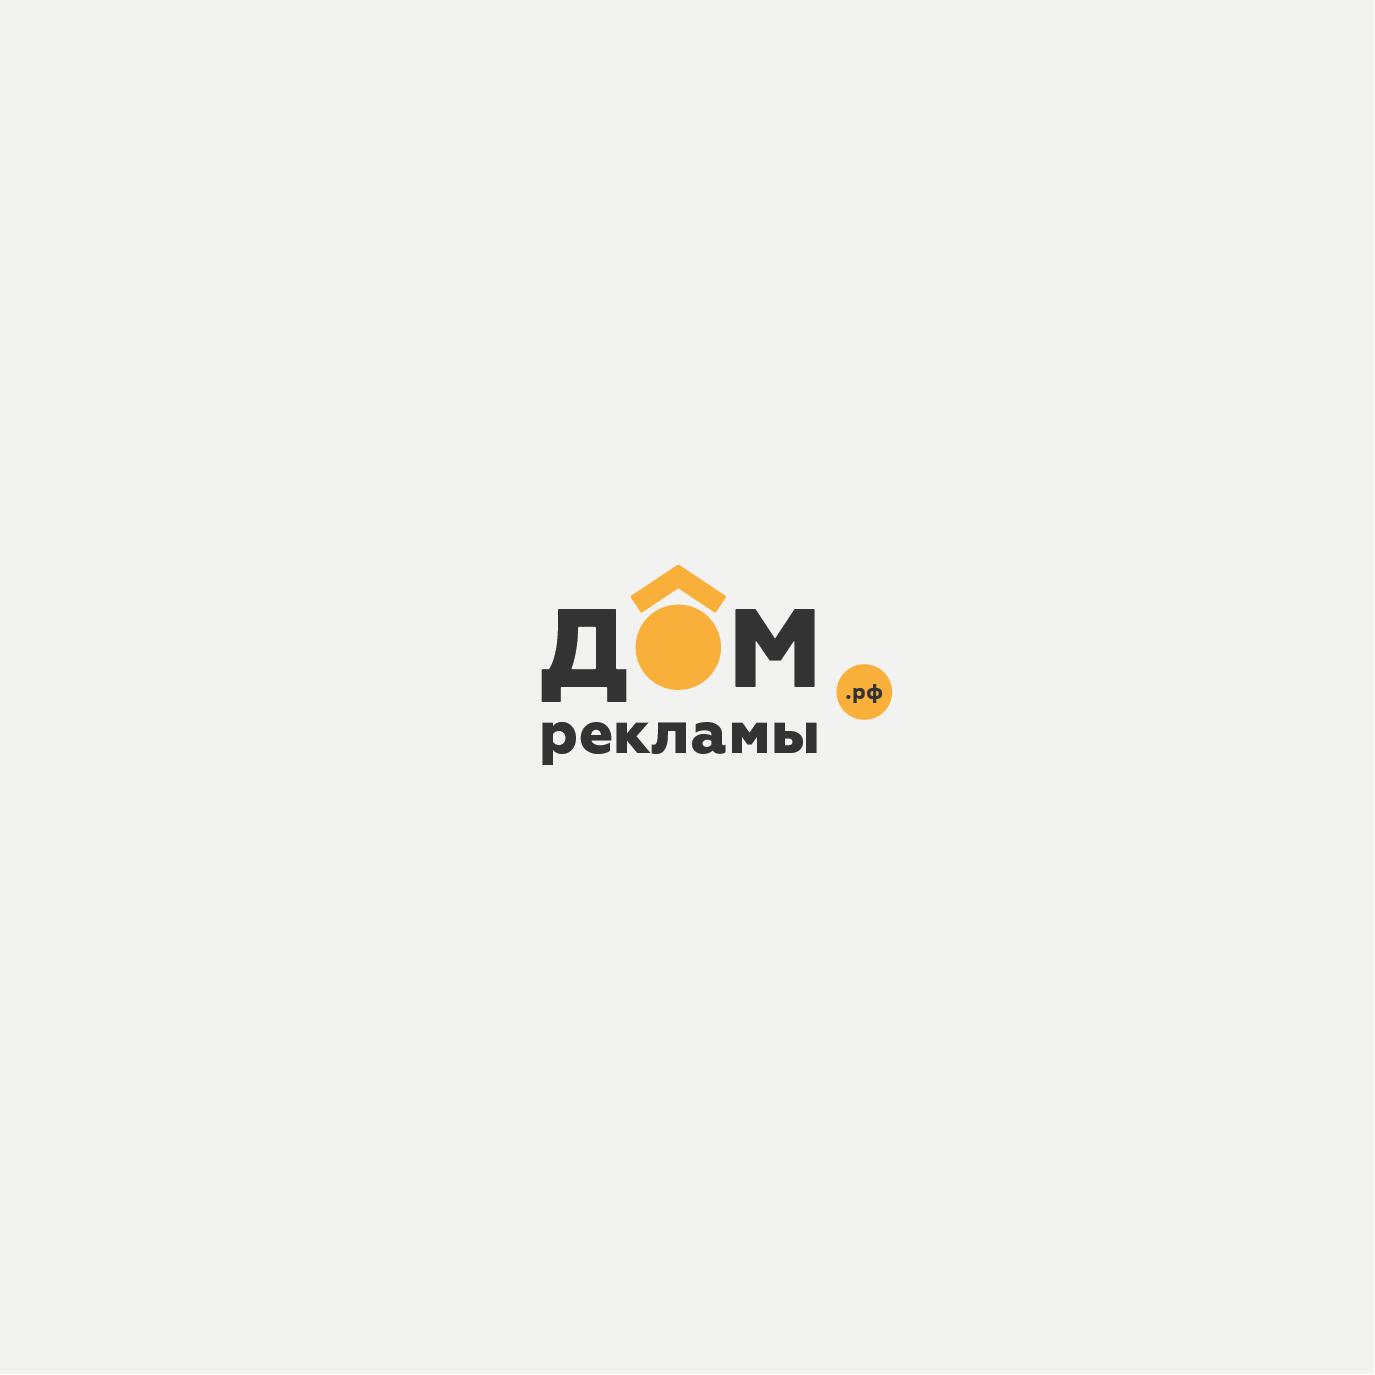 Дизайн логотипа рекламно-производственной компании фото f_7135edeac23bf6f1.png